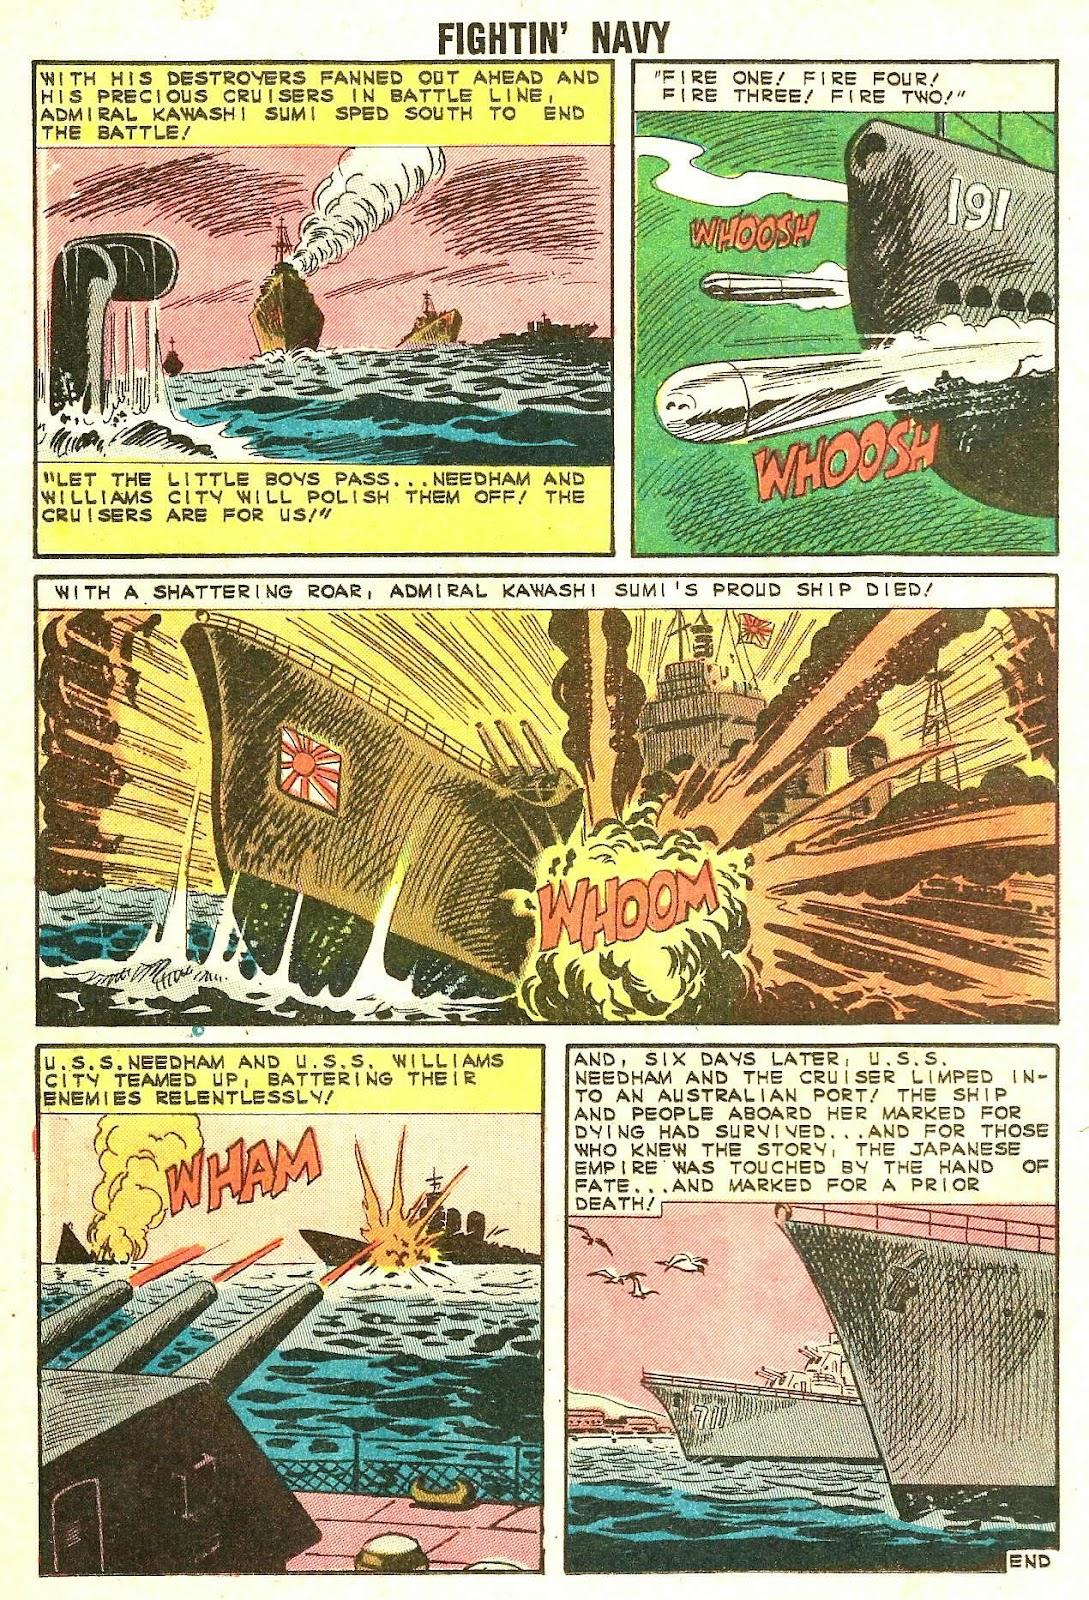 Read online Fightin' Navy comic -  Issue #114 - 12